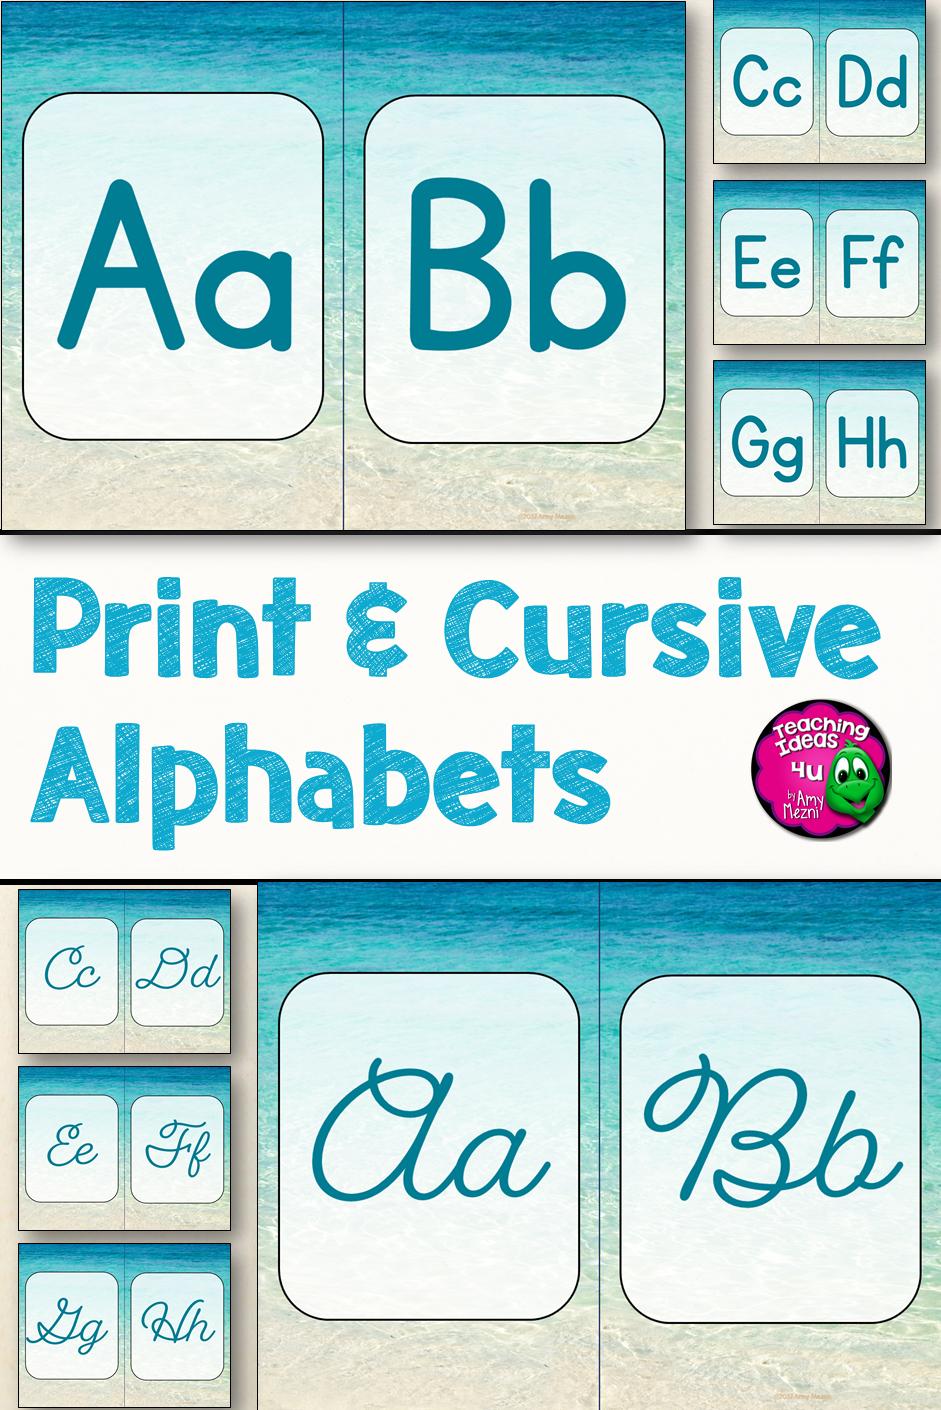 Beach & Ocean Print & Cursive Alphabets Classroom Decor Blue